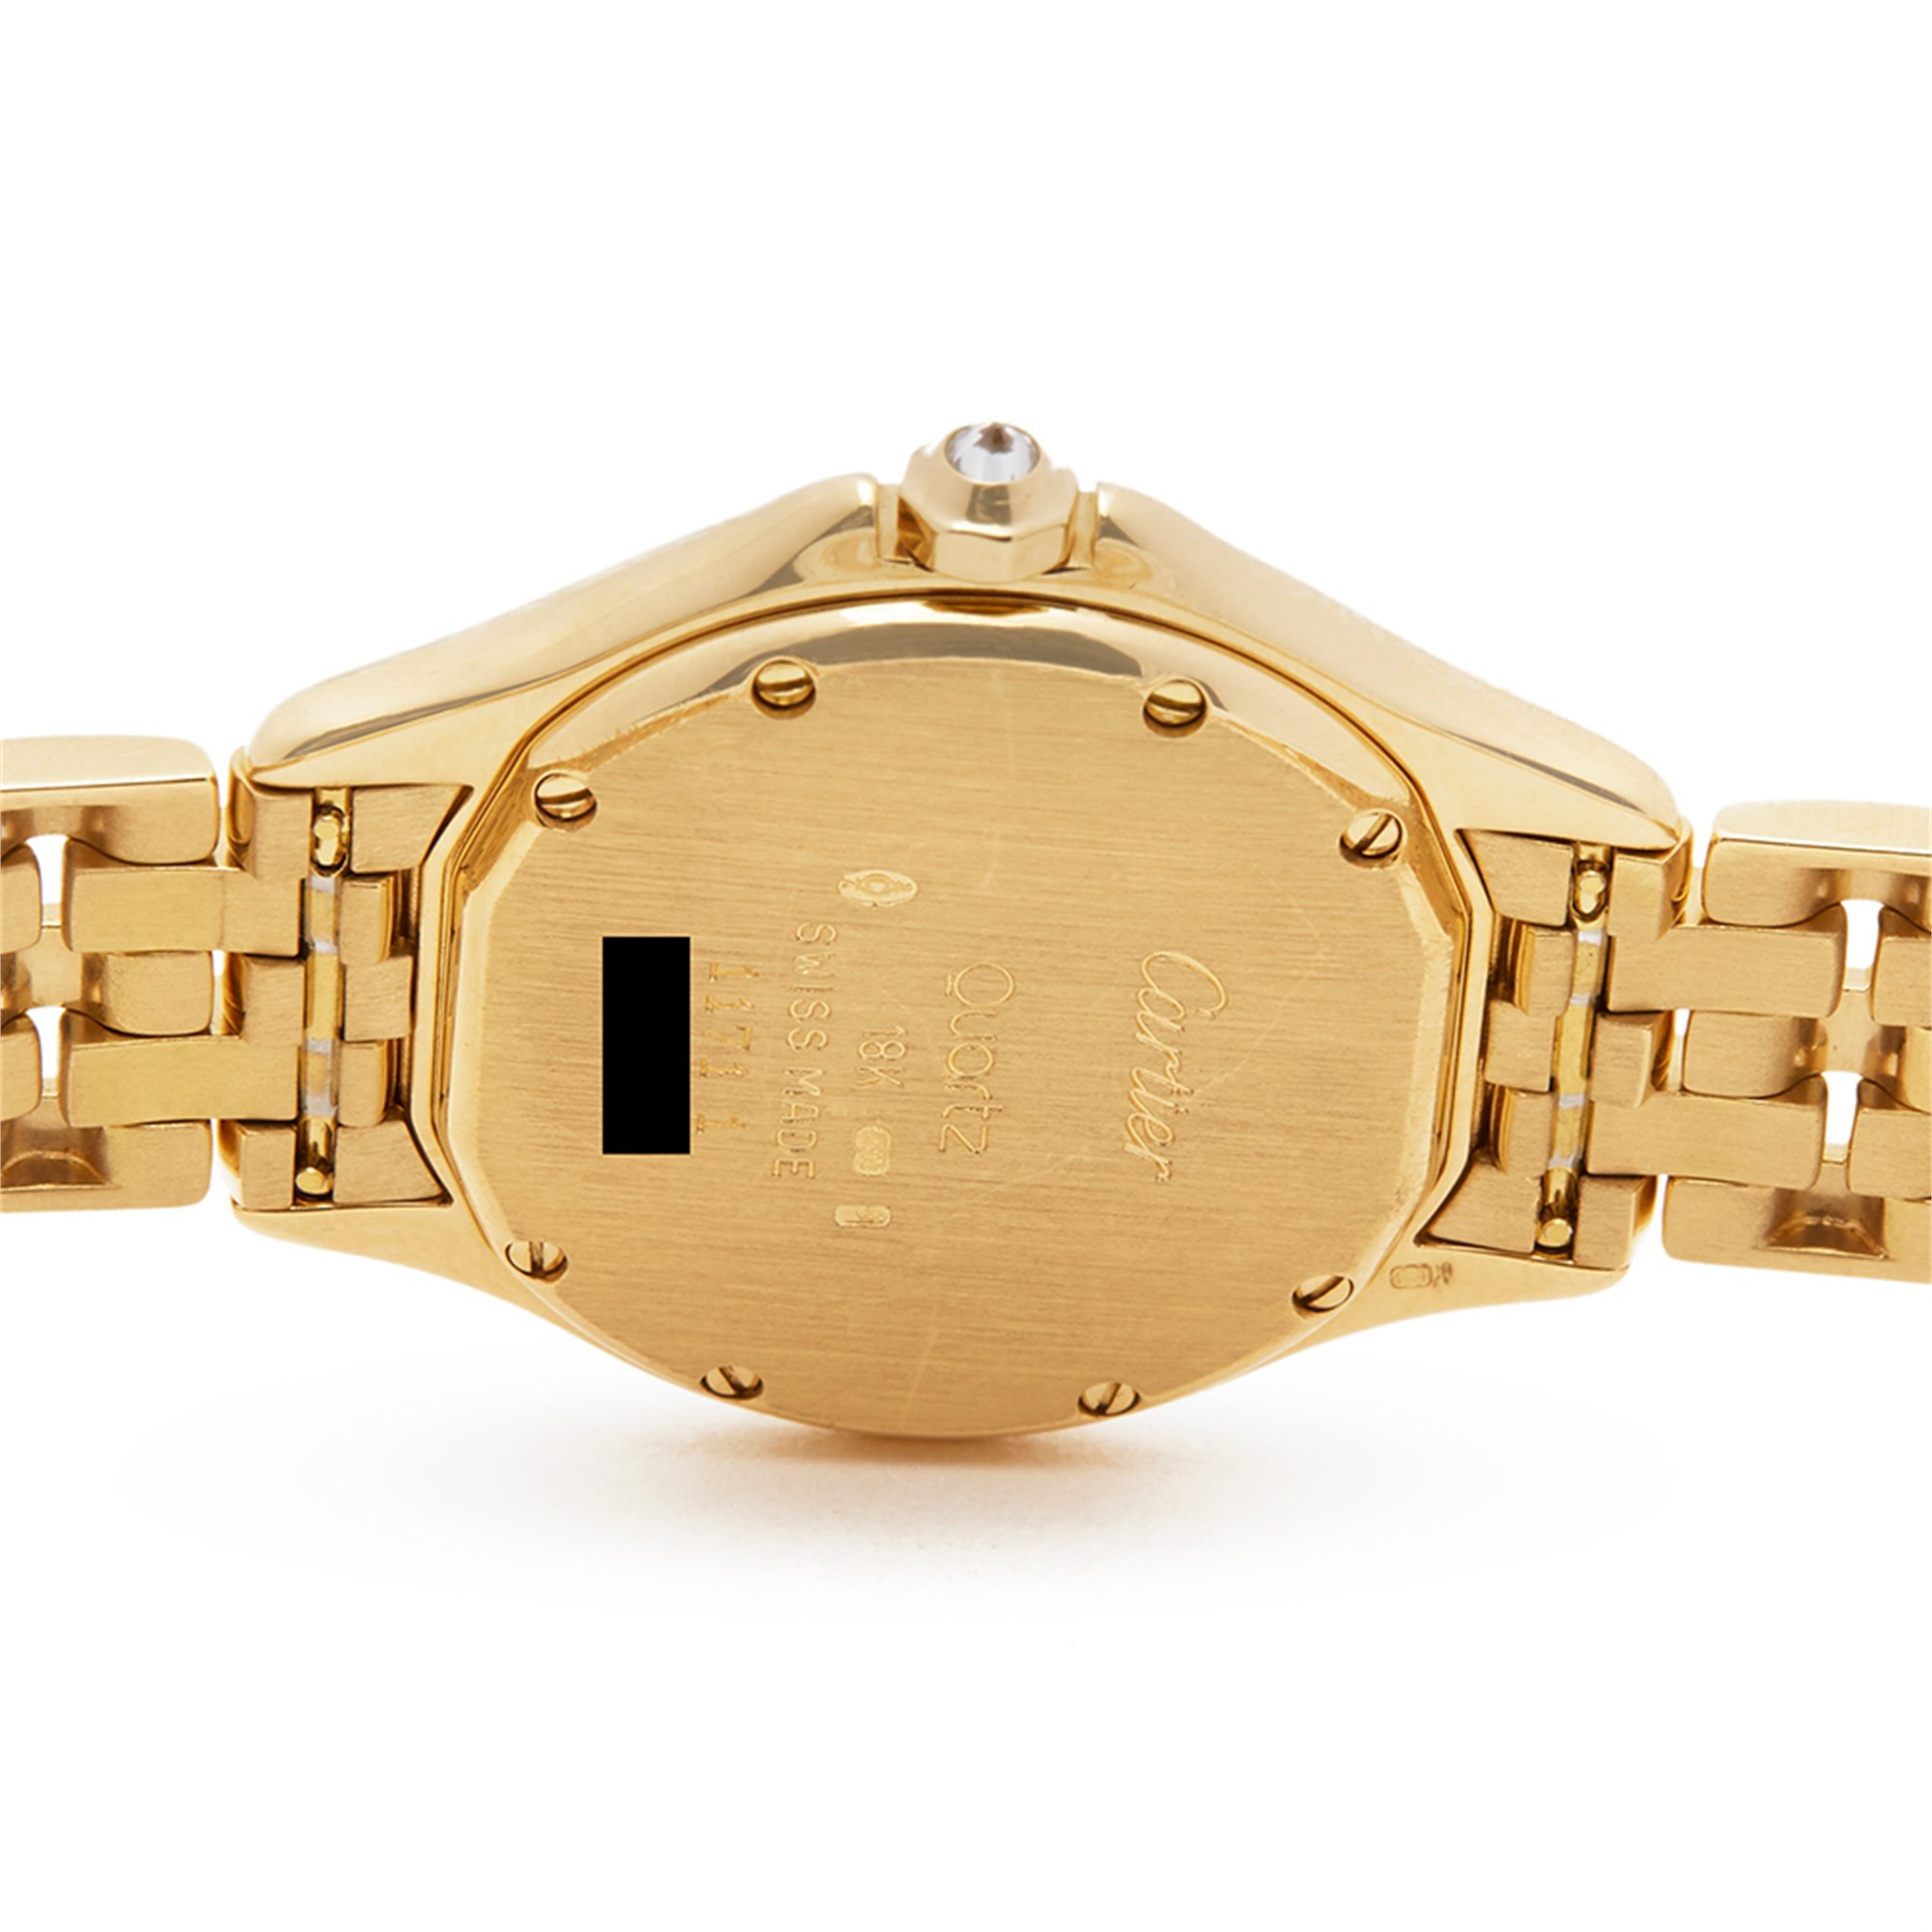 Cartier Panthère Cougar Diamond Yellow Gold WF8008B9 or 1171